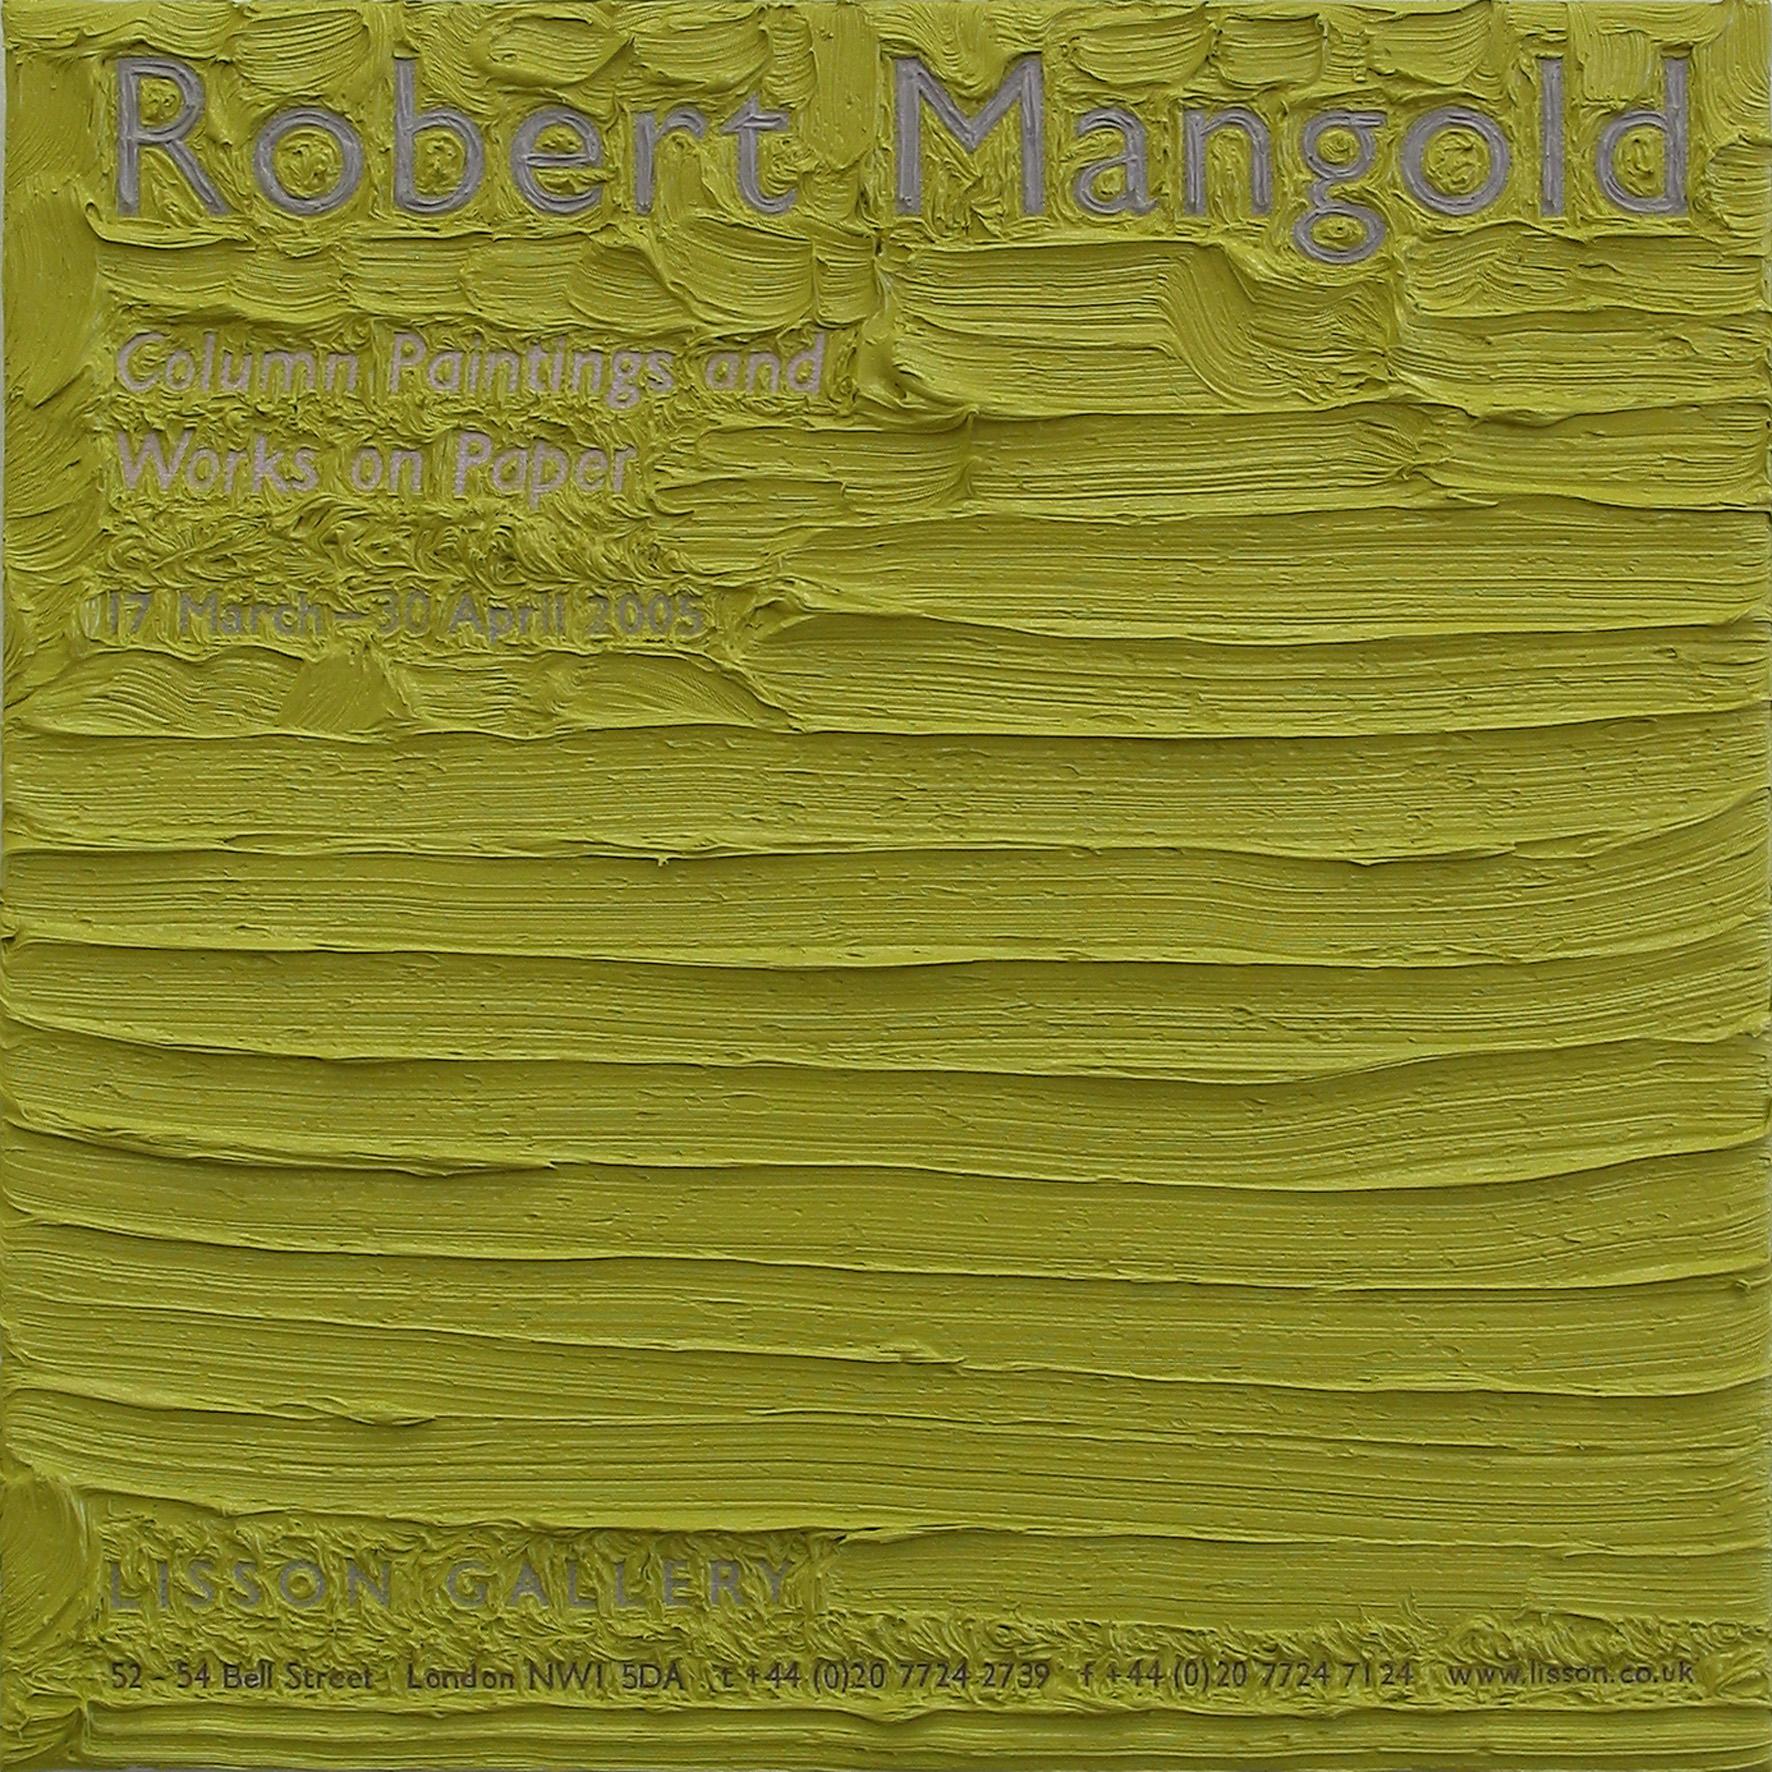 Robert Mangold at Lisson